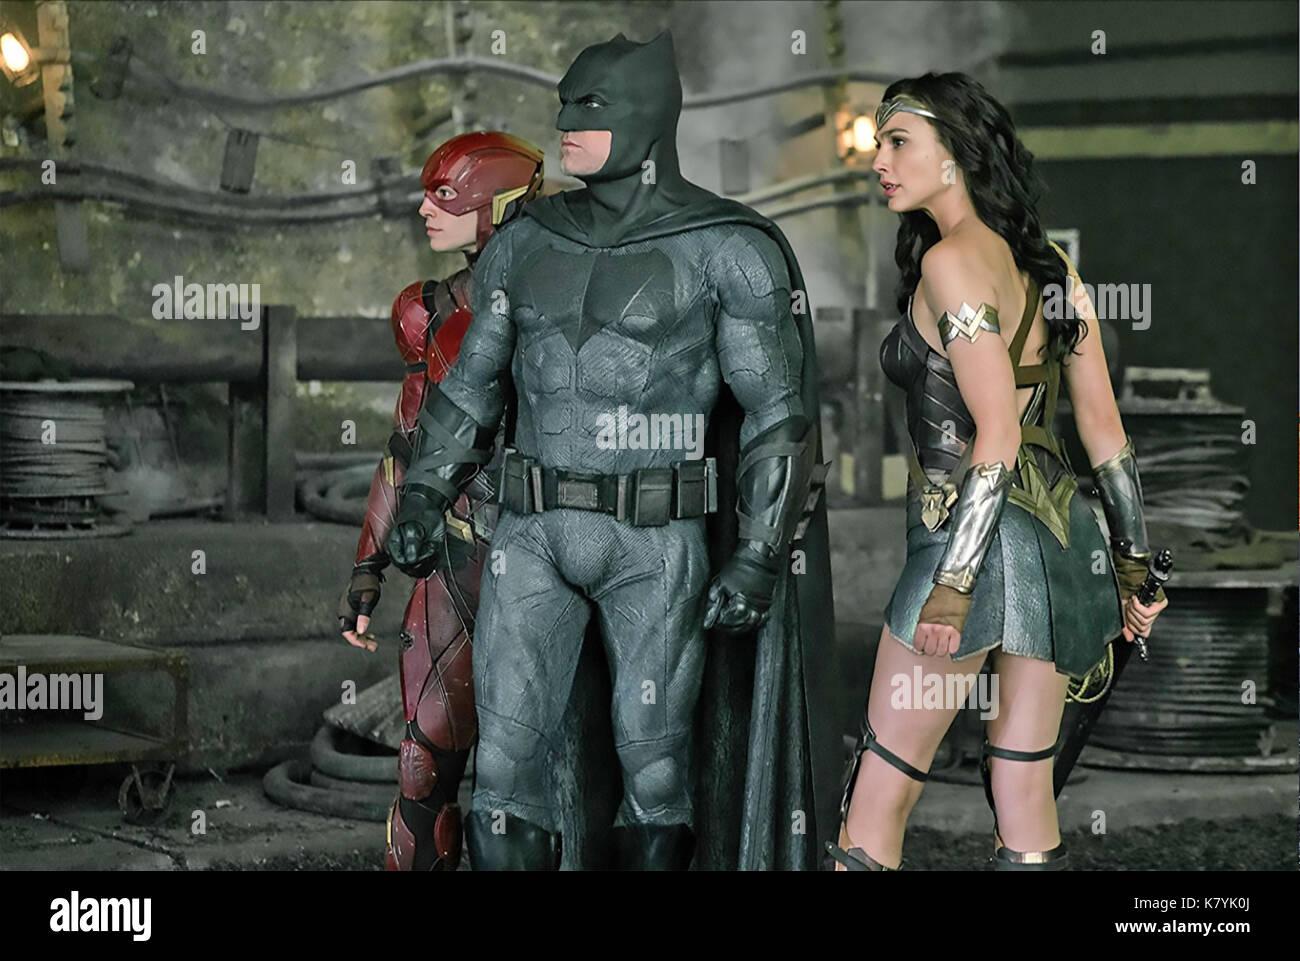 JUSTICE LEAGUE 2017 DC Comics film with from left Ezra Miller, Ben Afleck, Gal Gadot - Stock Image